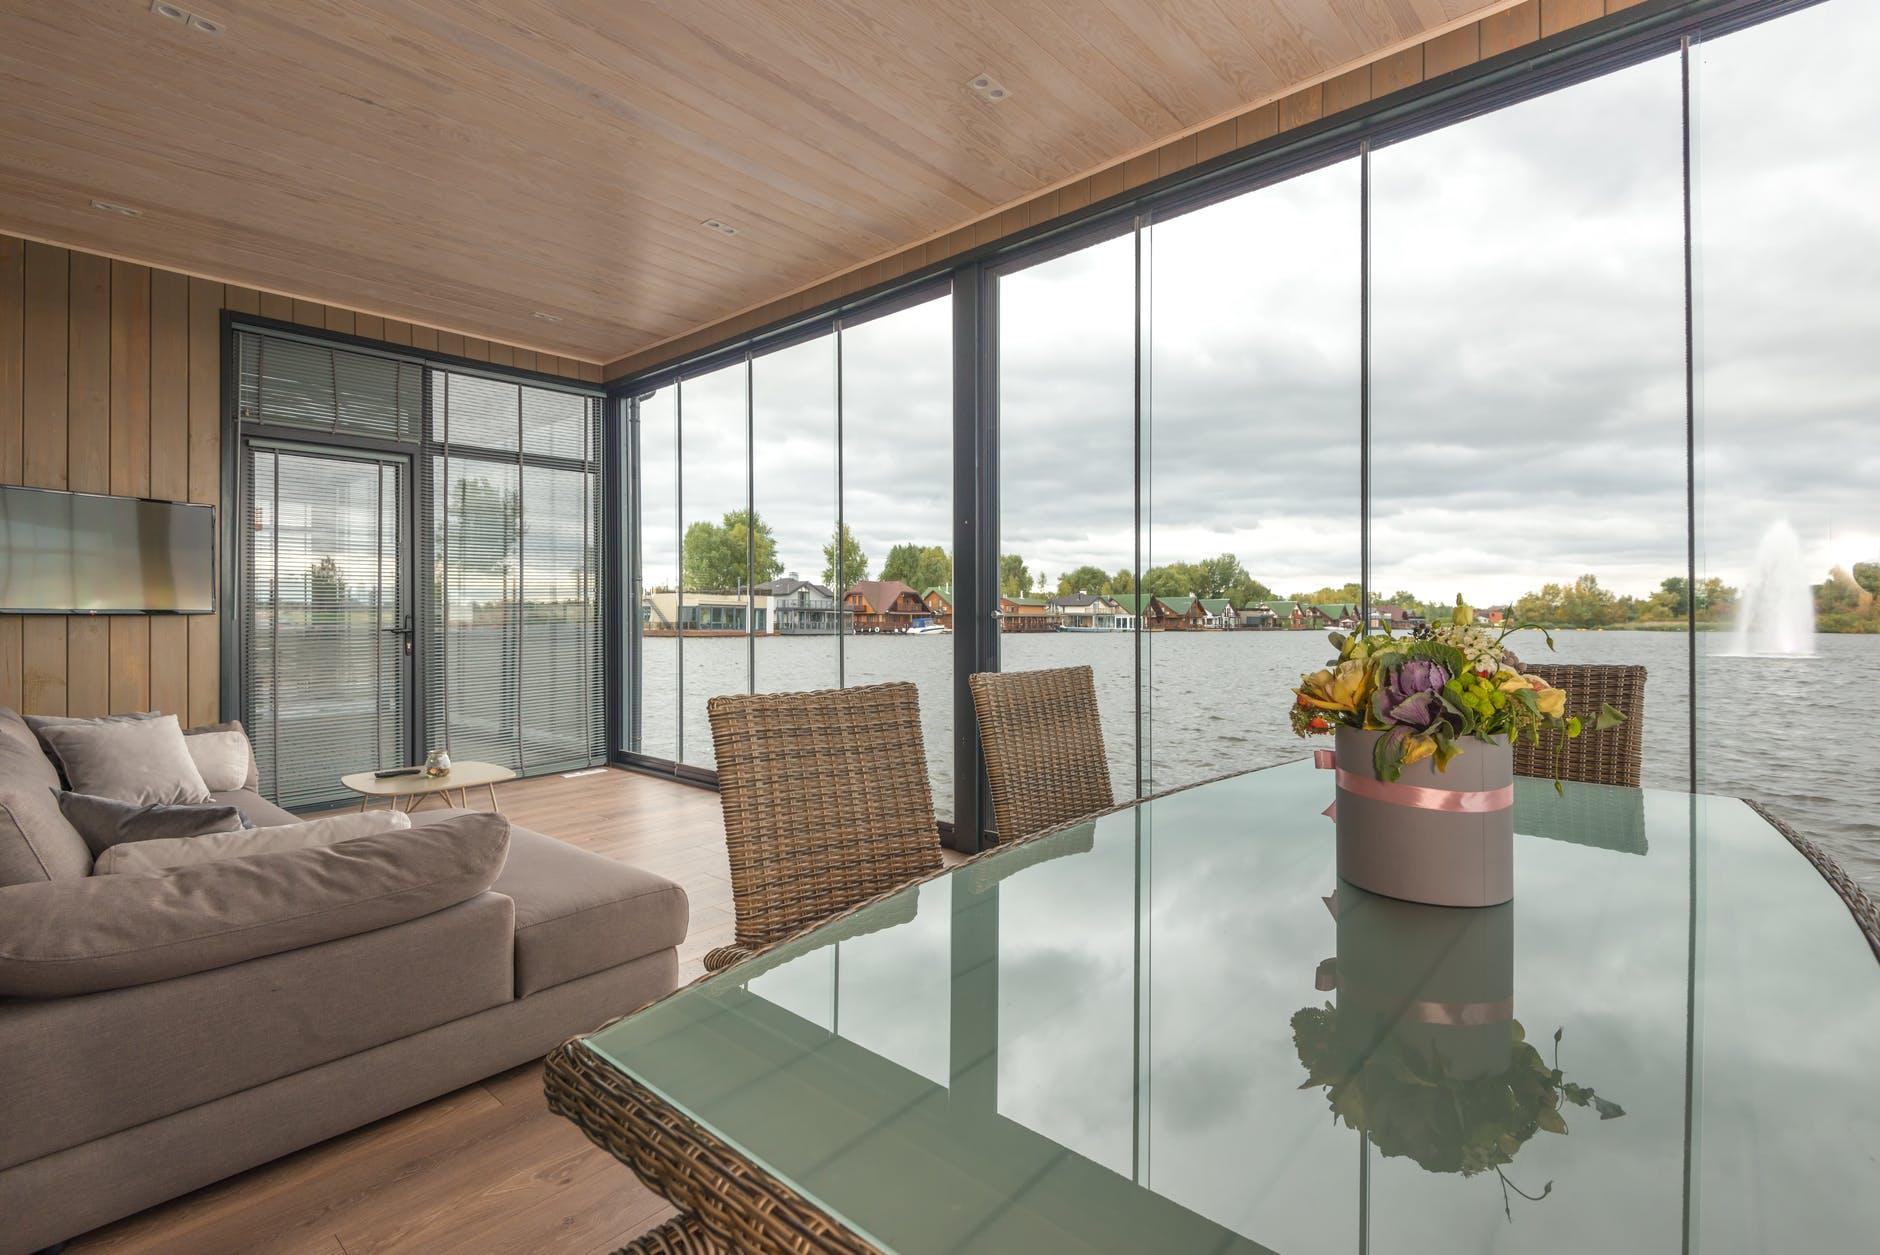 Restaurant Table Design Ideas for Ritzy Interior Look